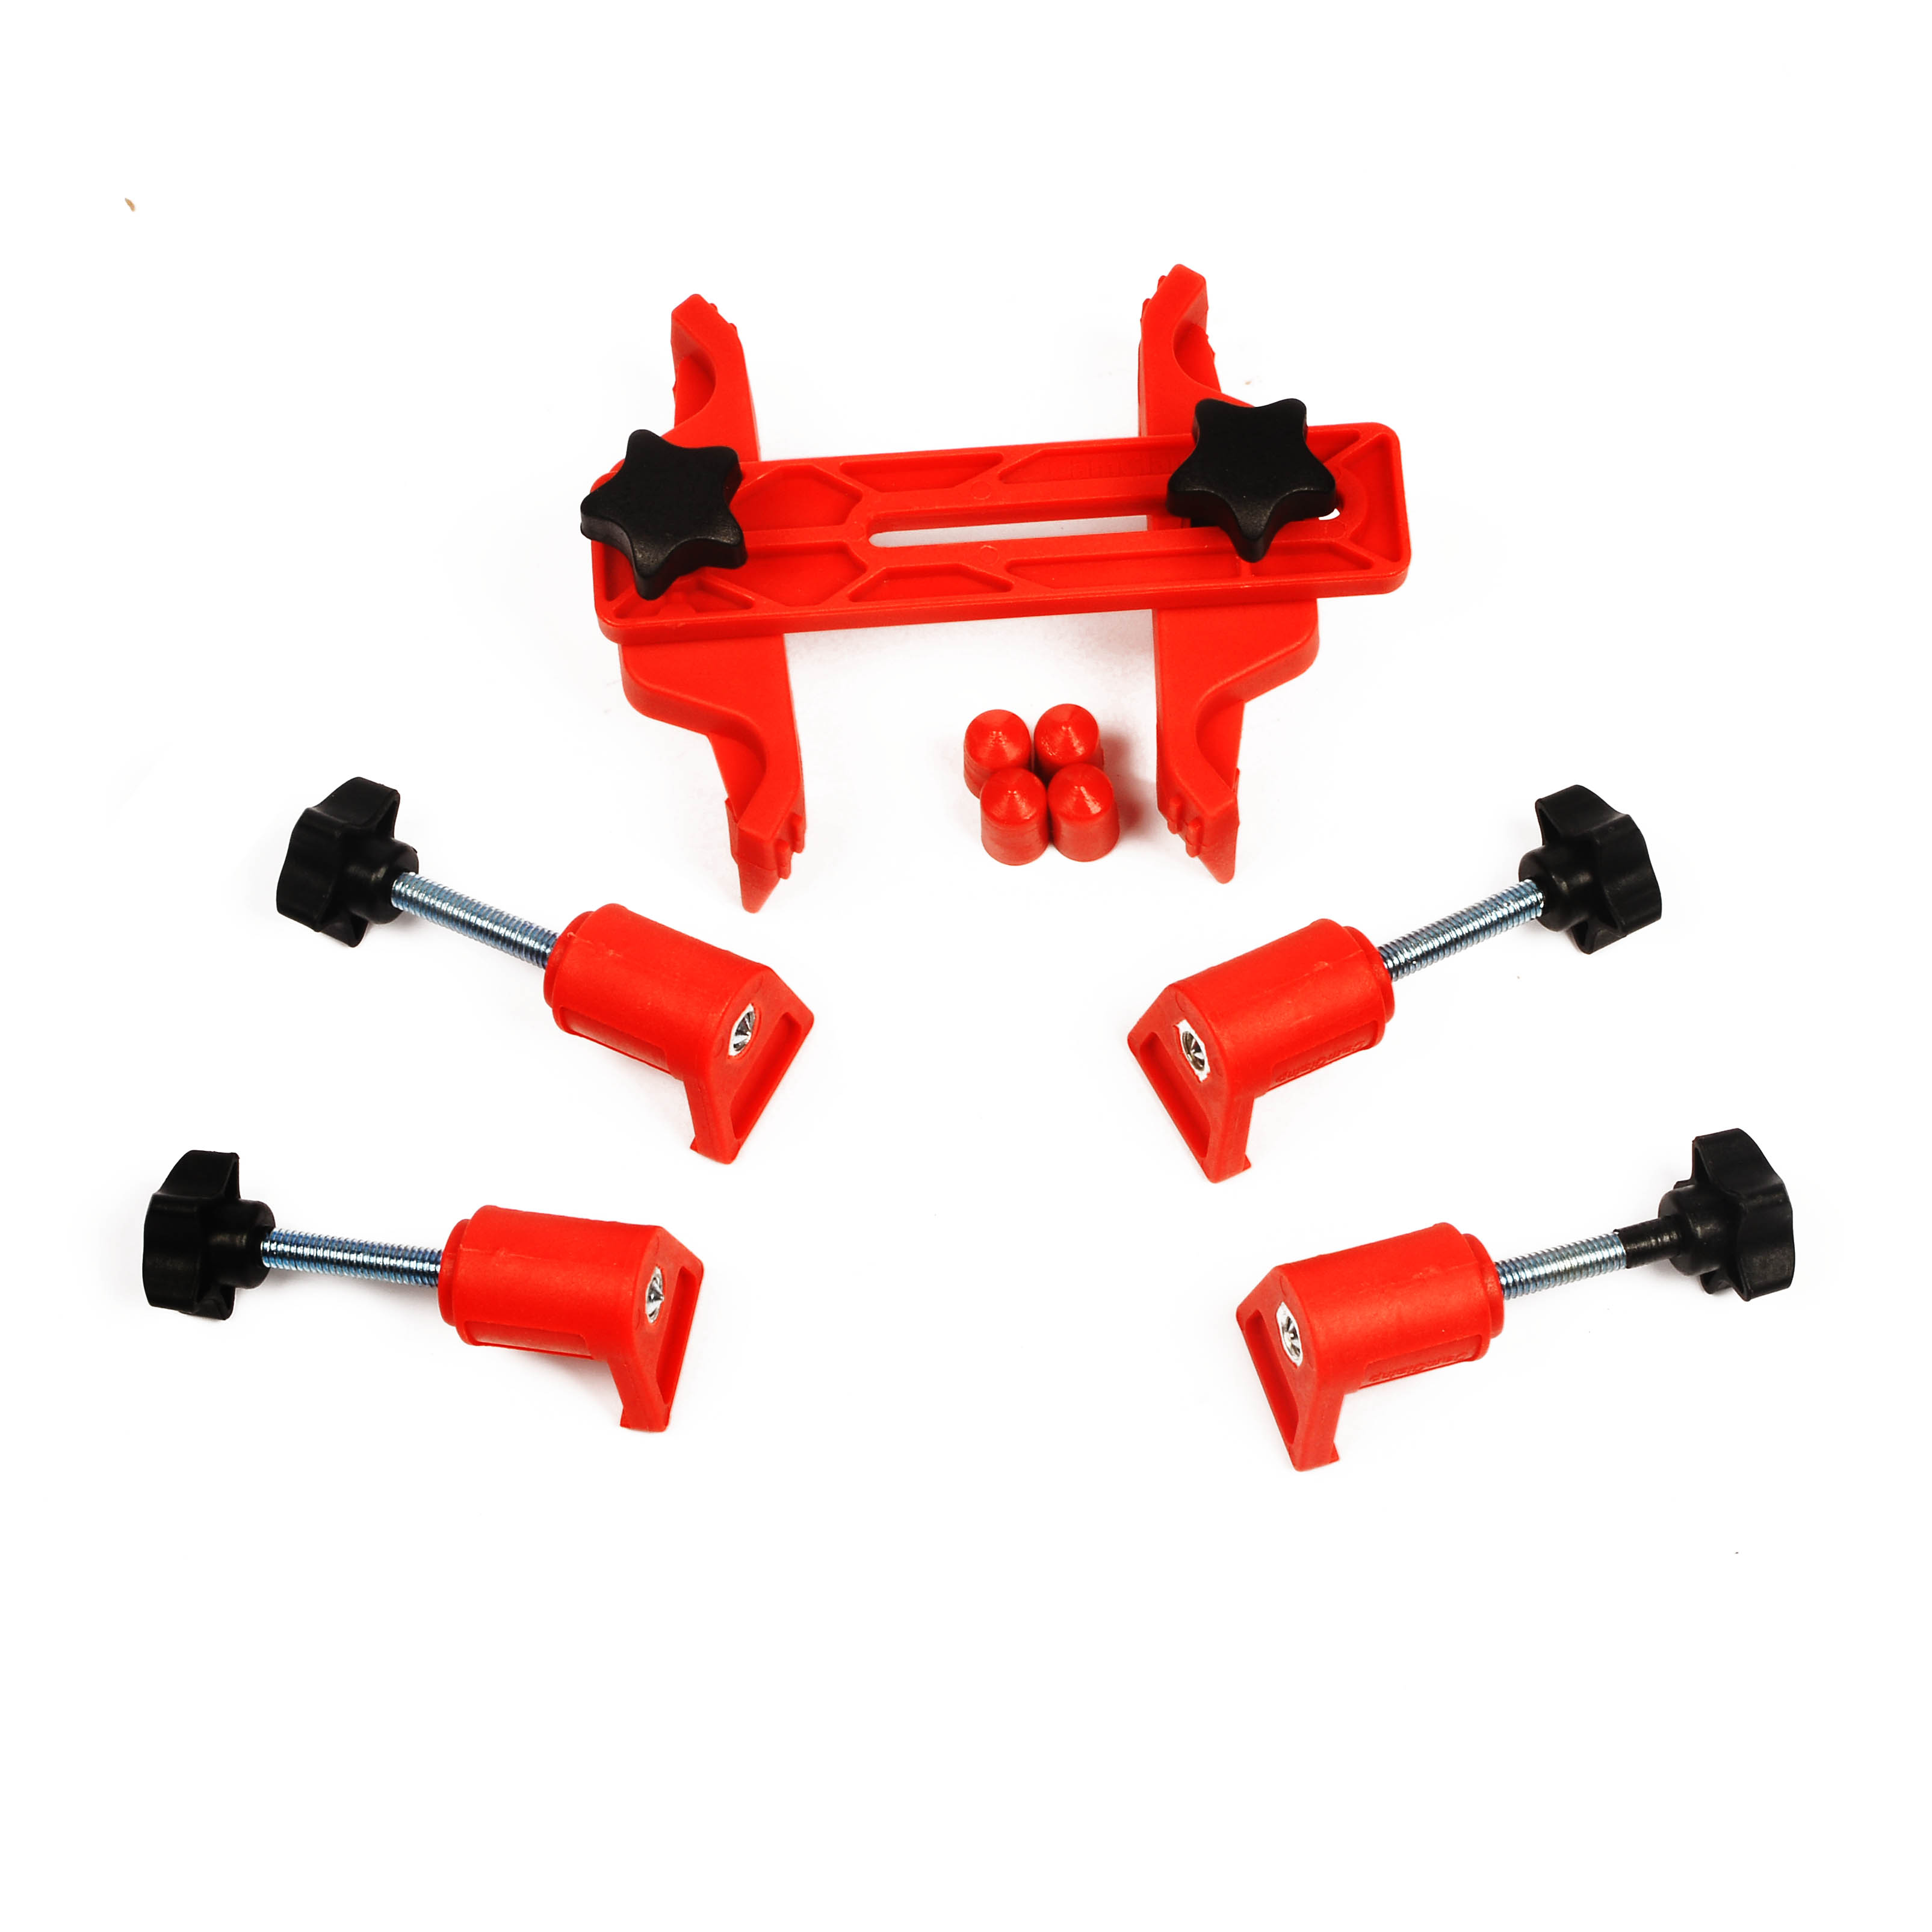 5pc Master Universal Single Twin Quad Cam Clamp Locking Timing Tool Kit Camshaft